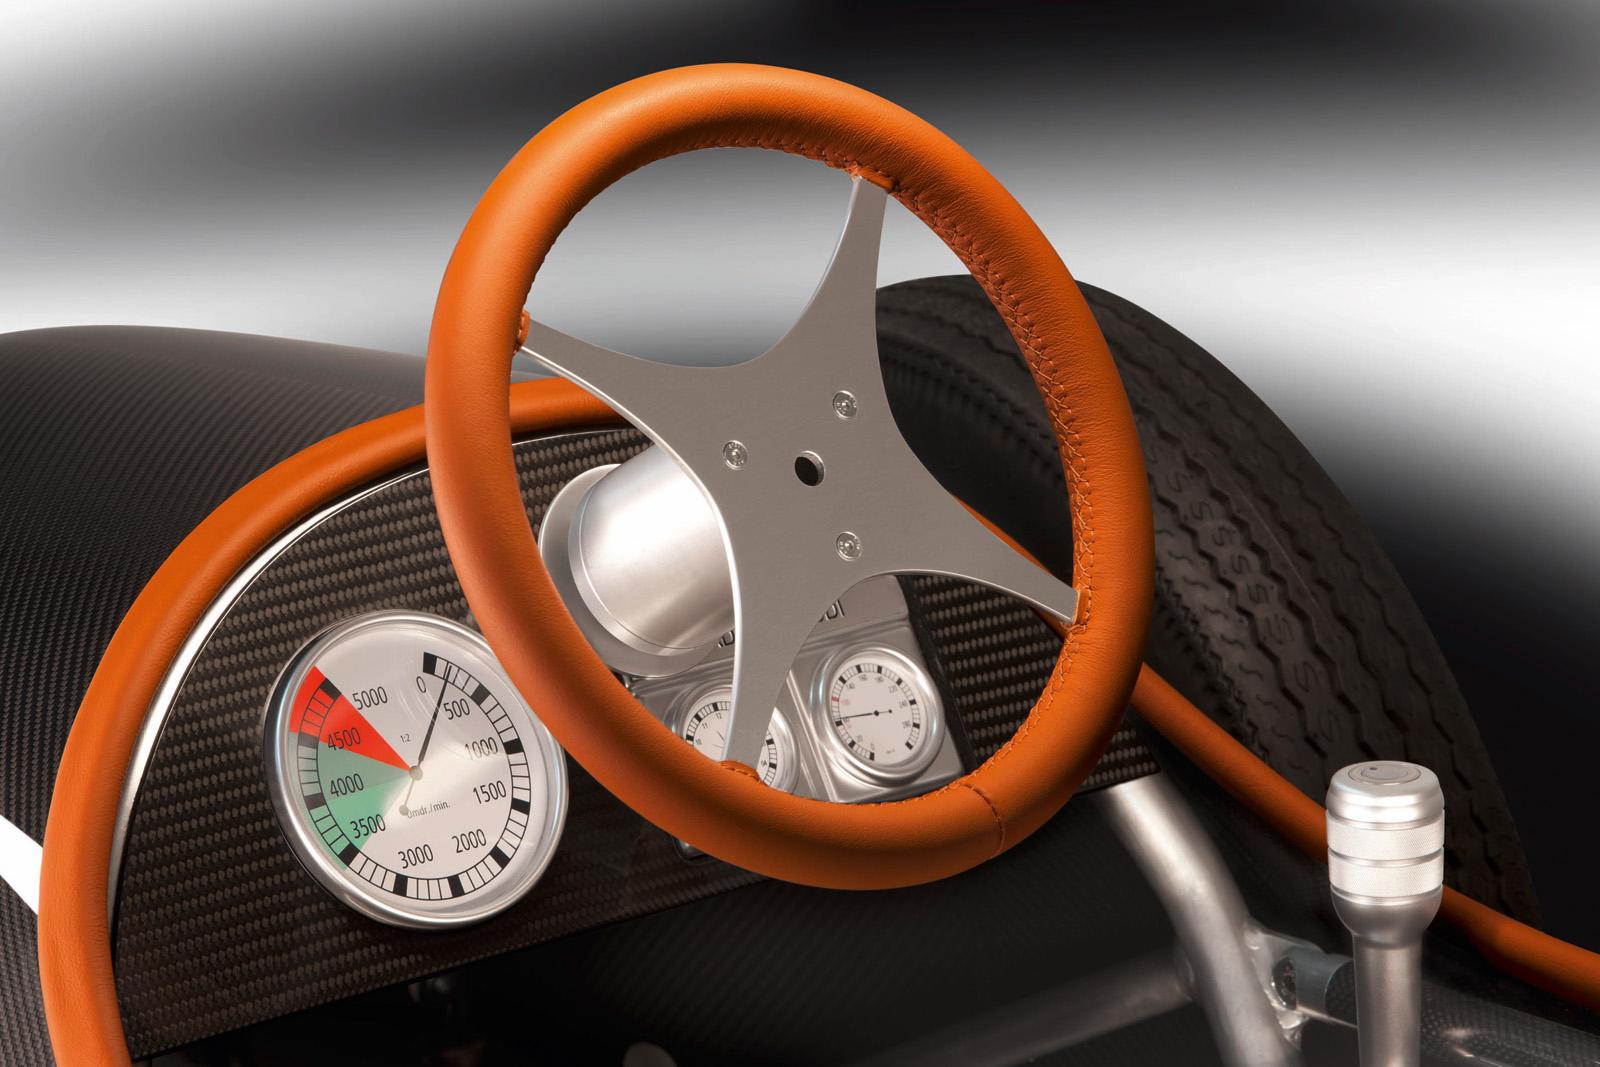 1295608938_audi2be-tron2bscale2bmodel2b3 Масштабная игрушка от Audi – Auto Union Type C e-tron!